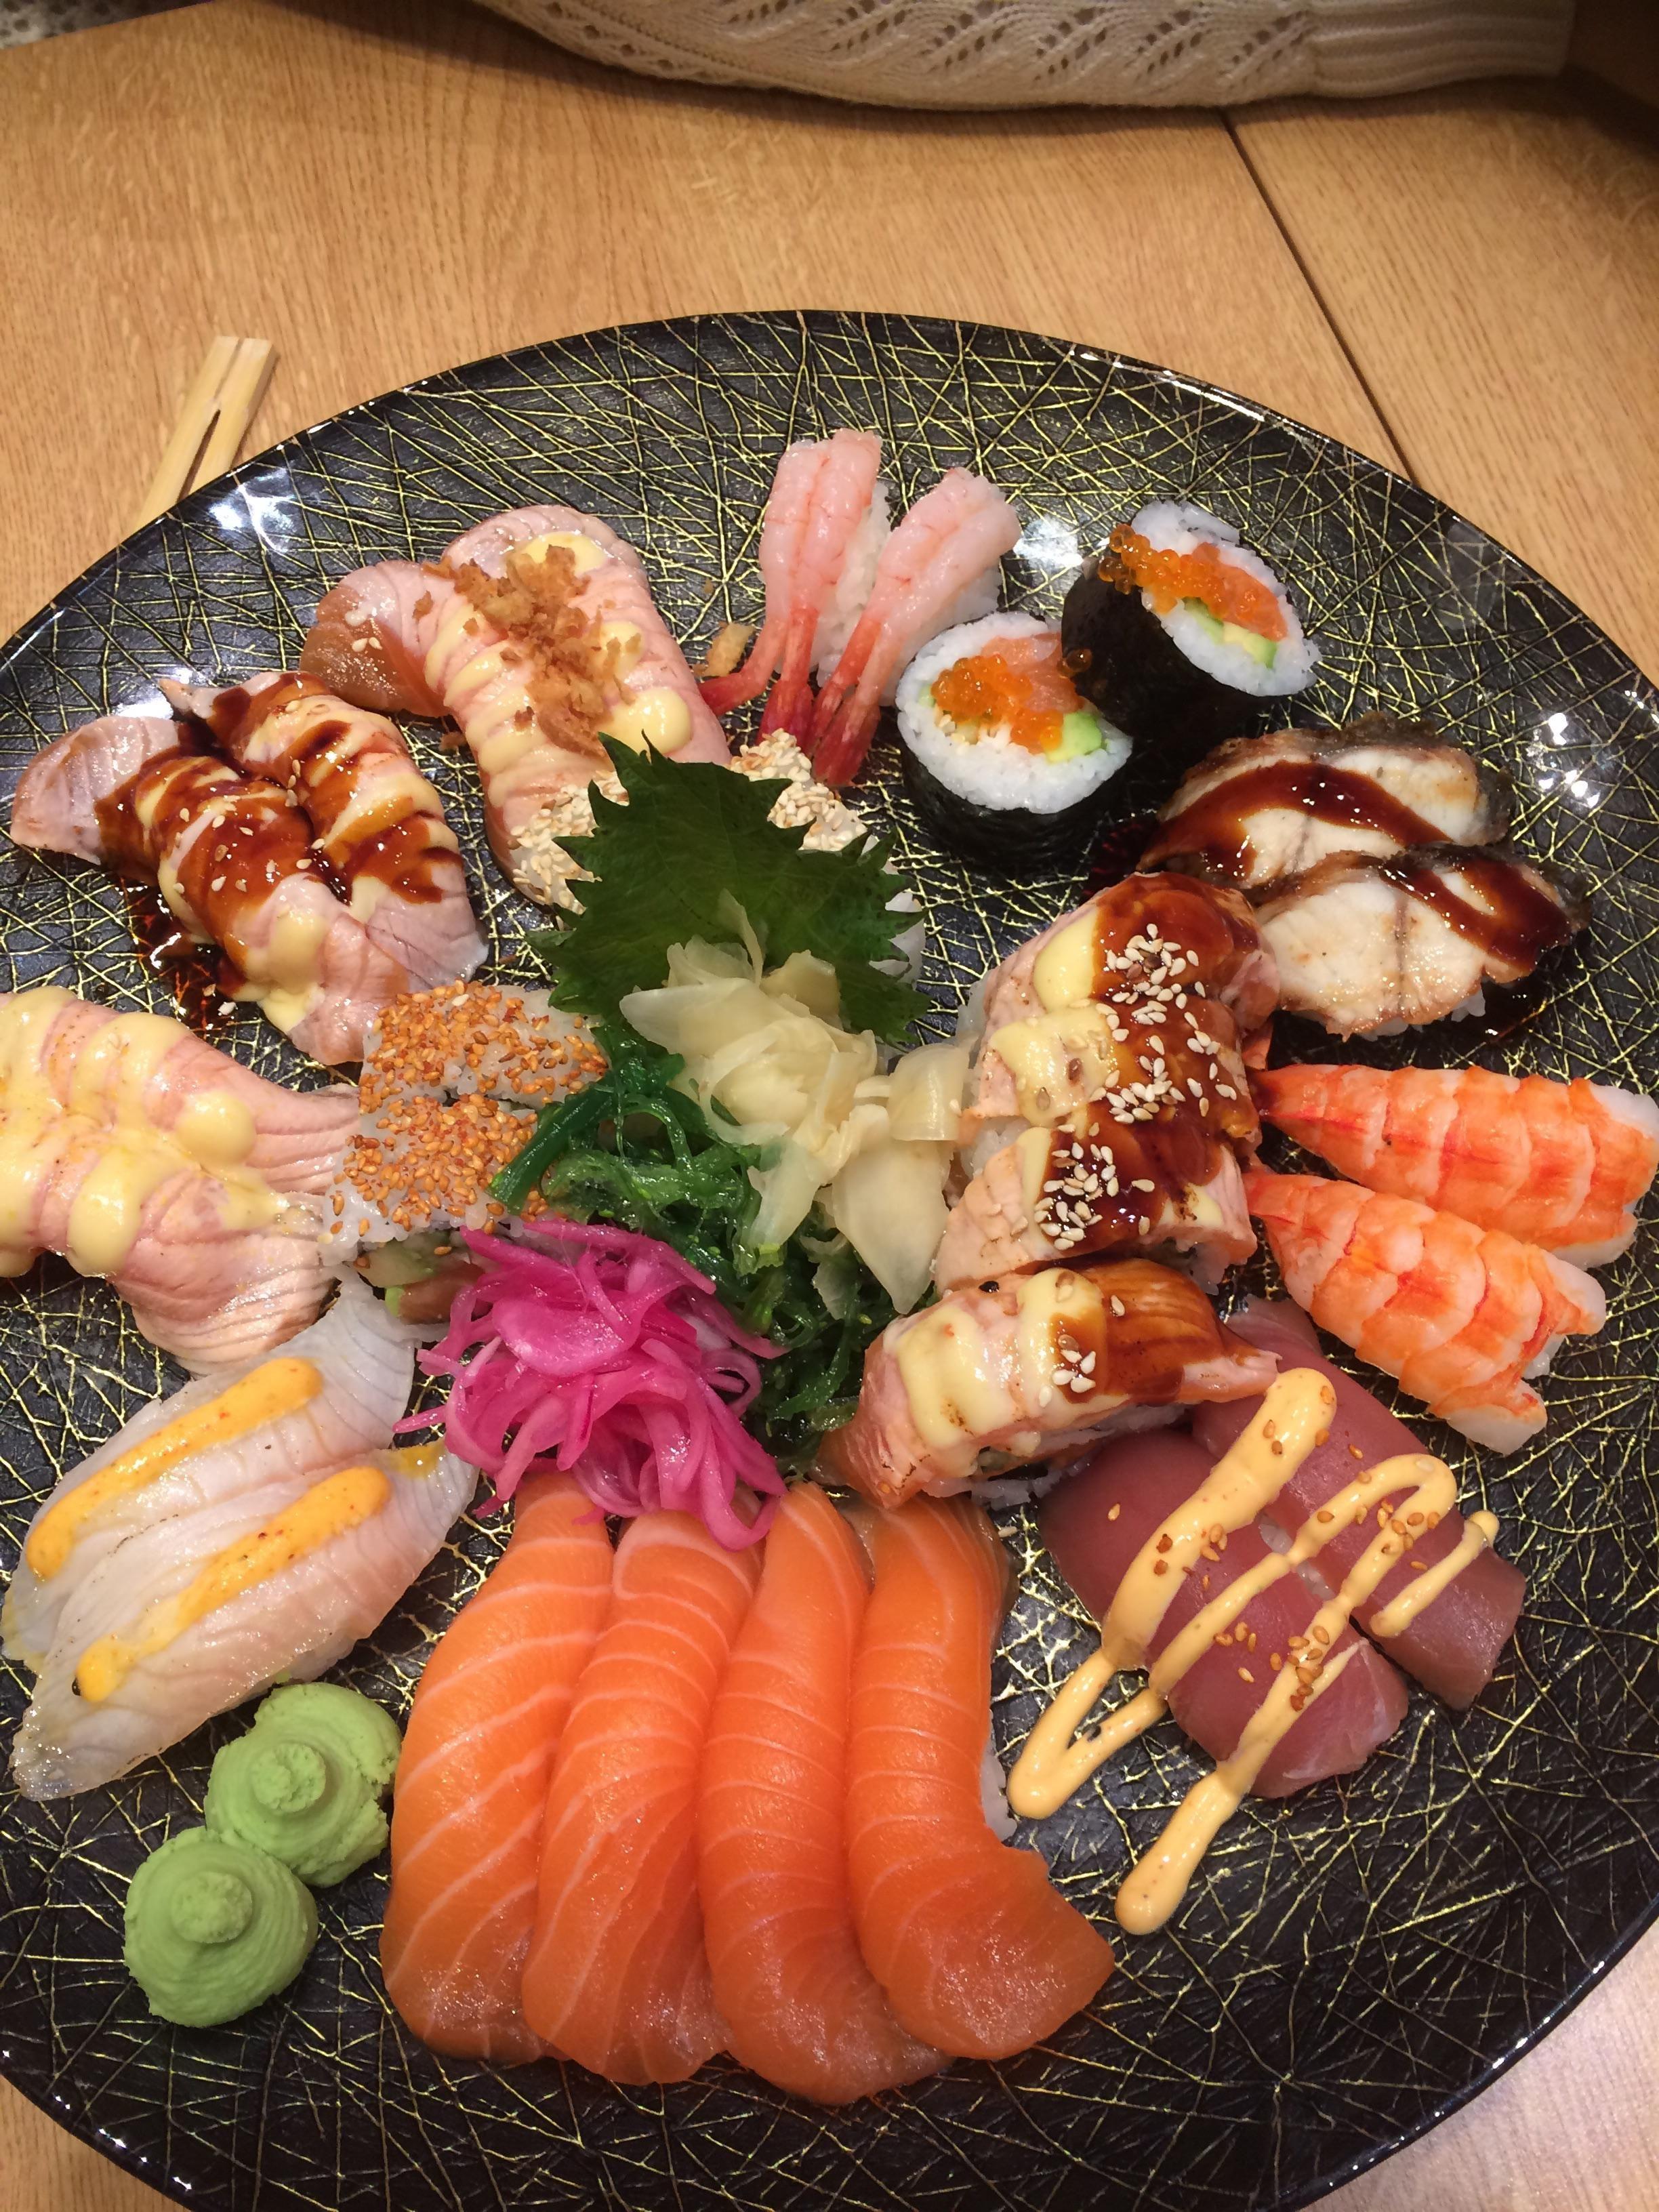 Matsu great sushi place in stockholm sushi food